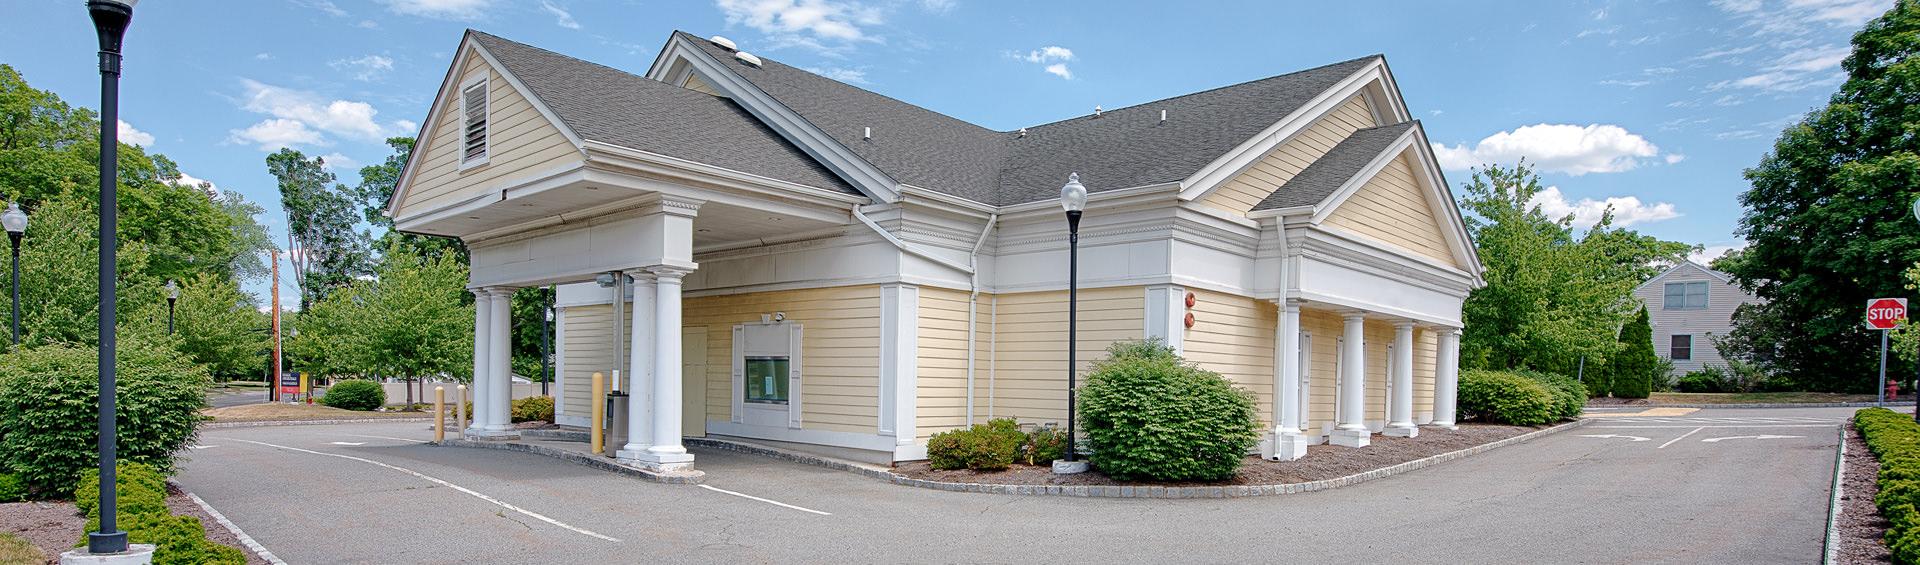 HSBC Bank - Florham Park | Florham Realty Management, LLC